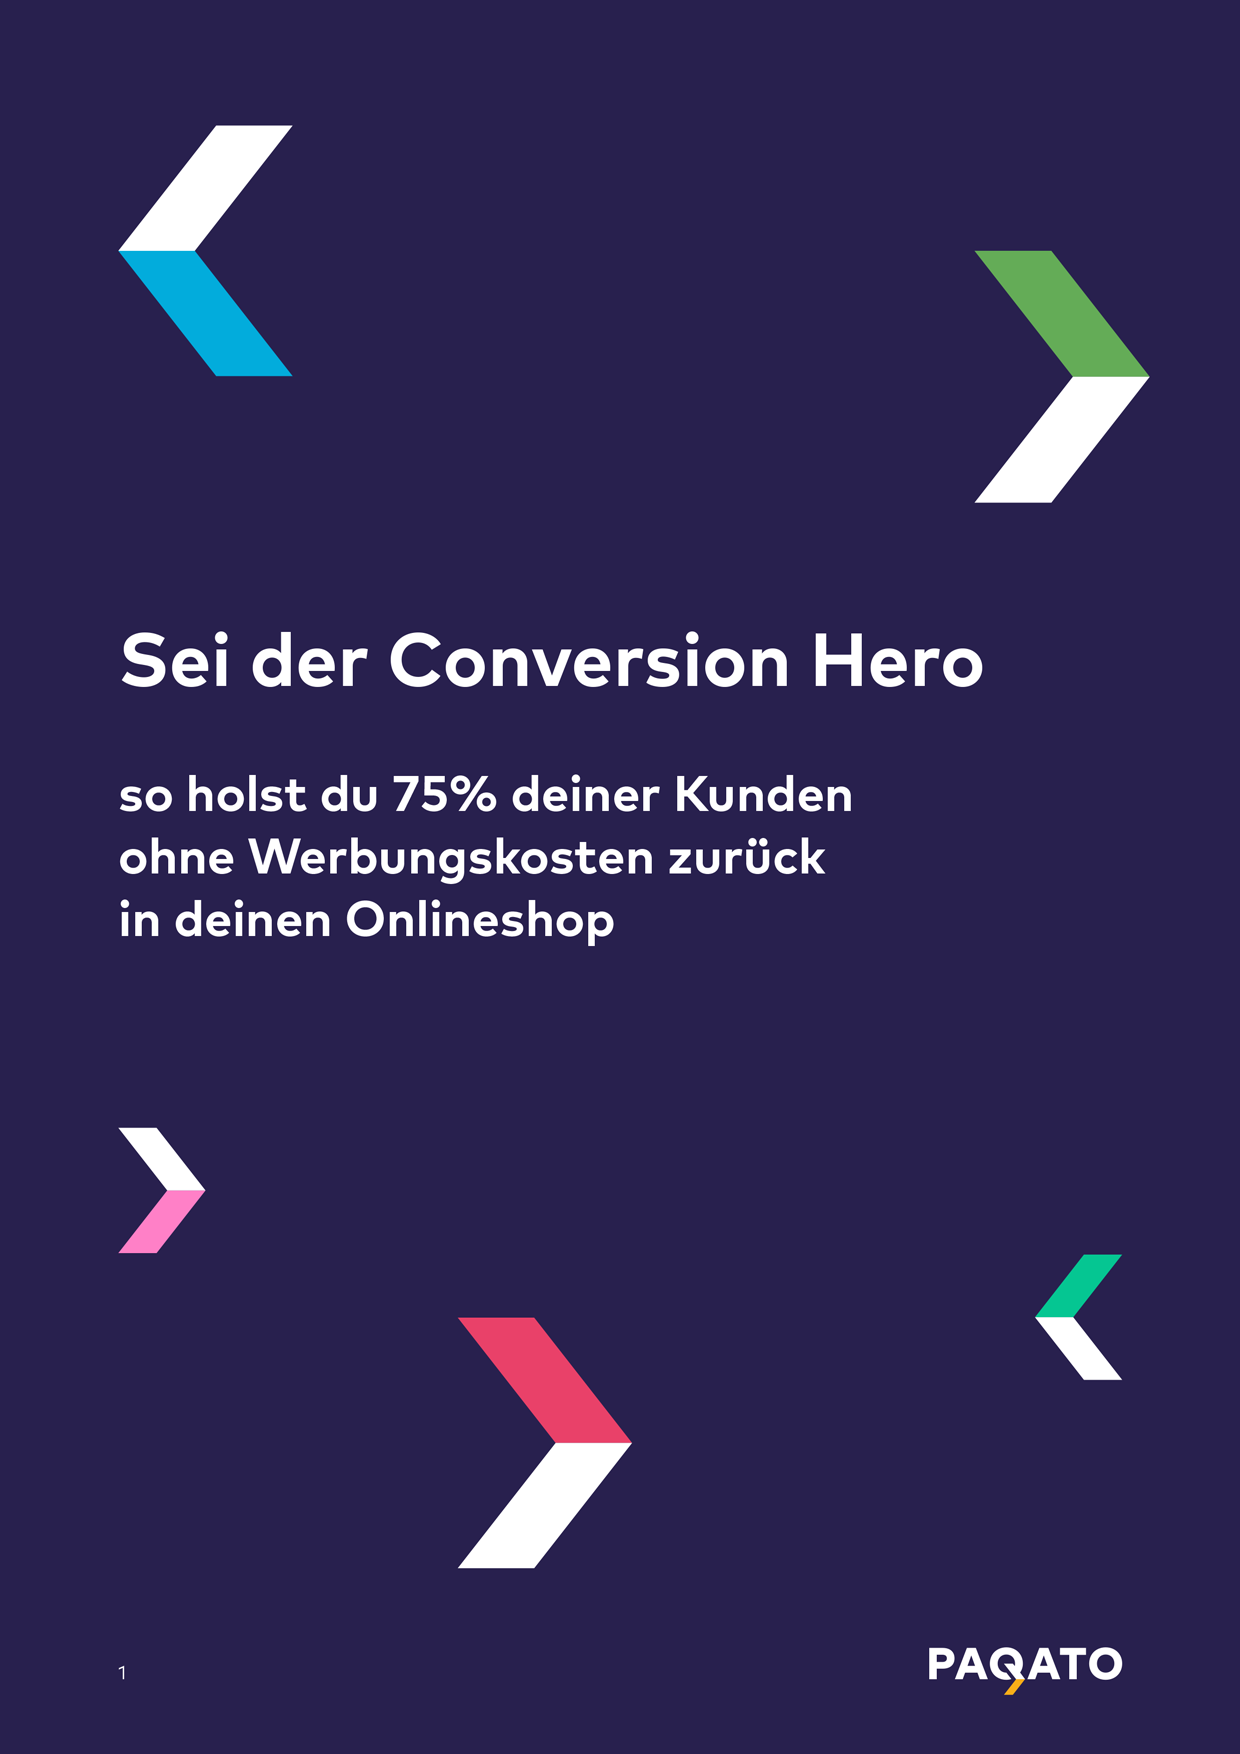 Sei der Conversion Hero!